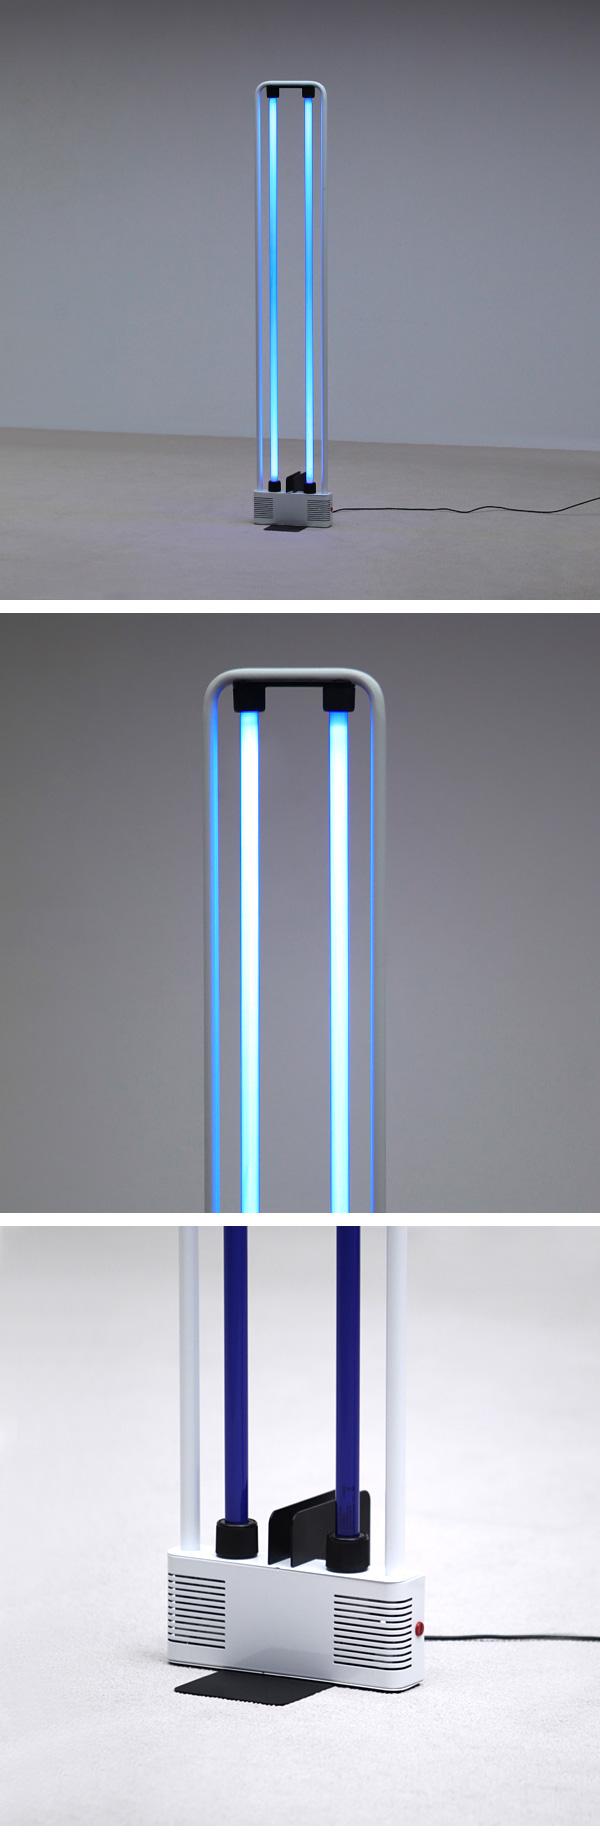 Gian Nicola, Gigante, Neon lamp, Design, 1981, Sottsass